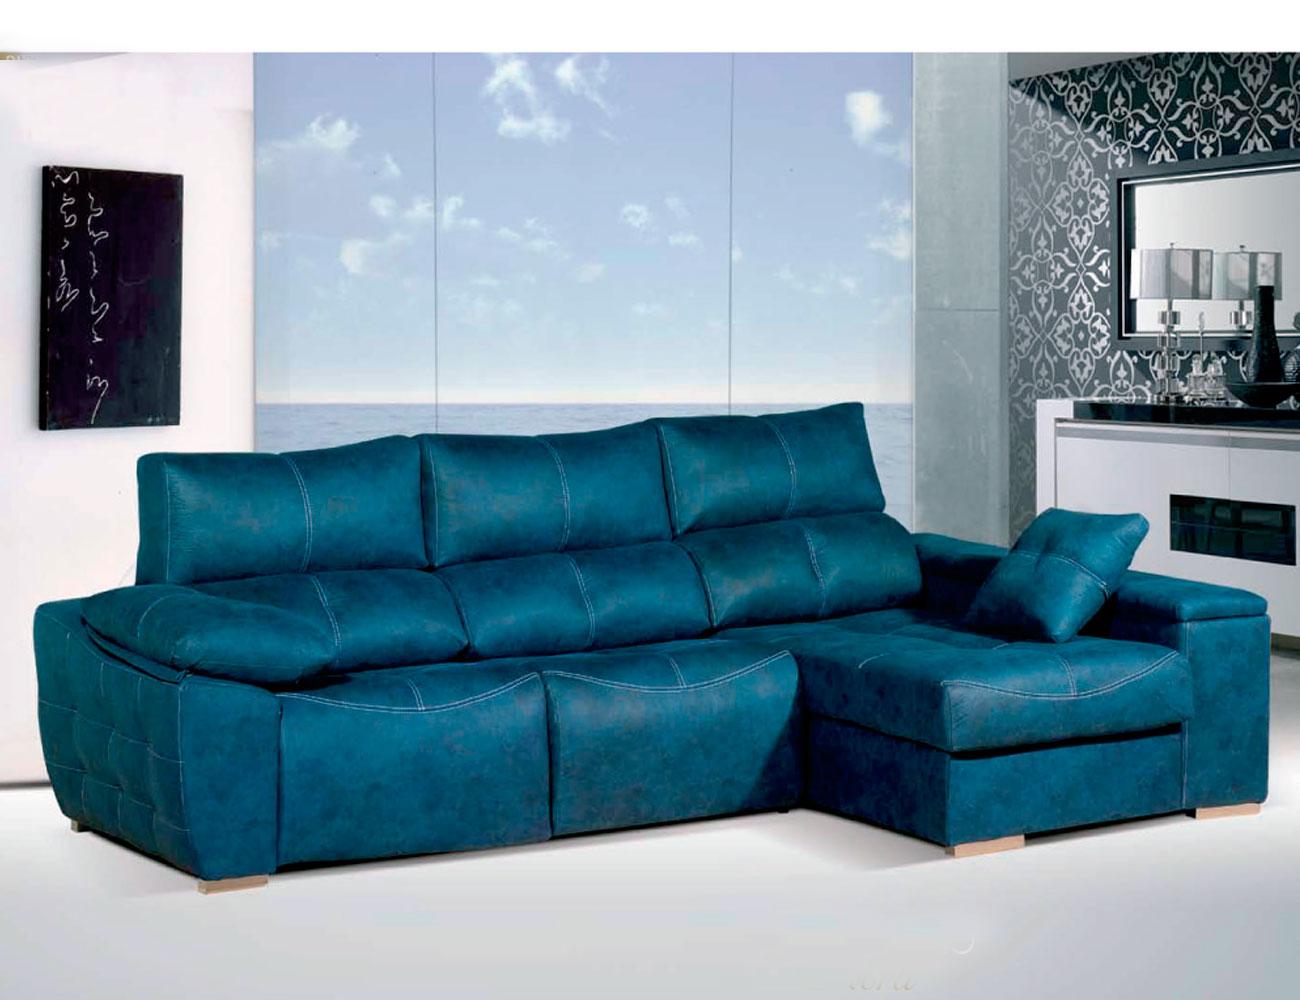 Sofa chaiselongue relax 2 motores anti manchas turquesa